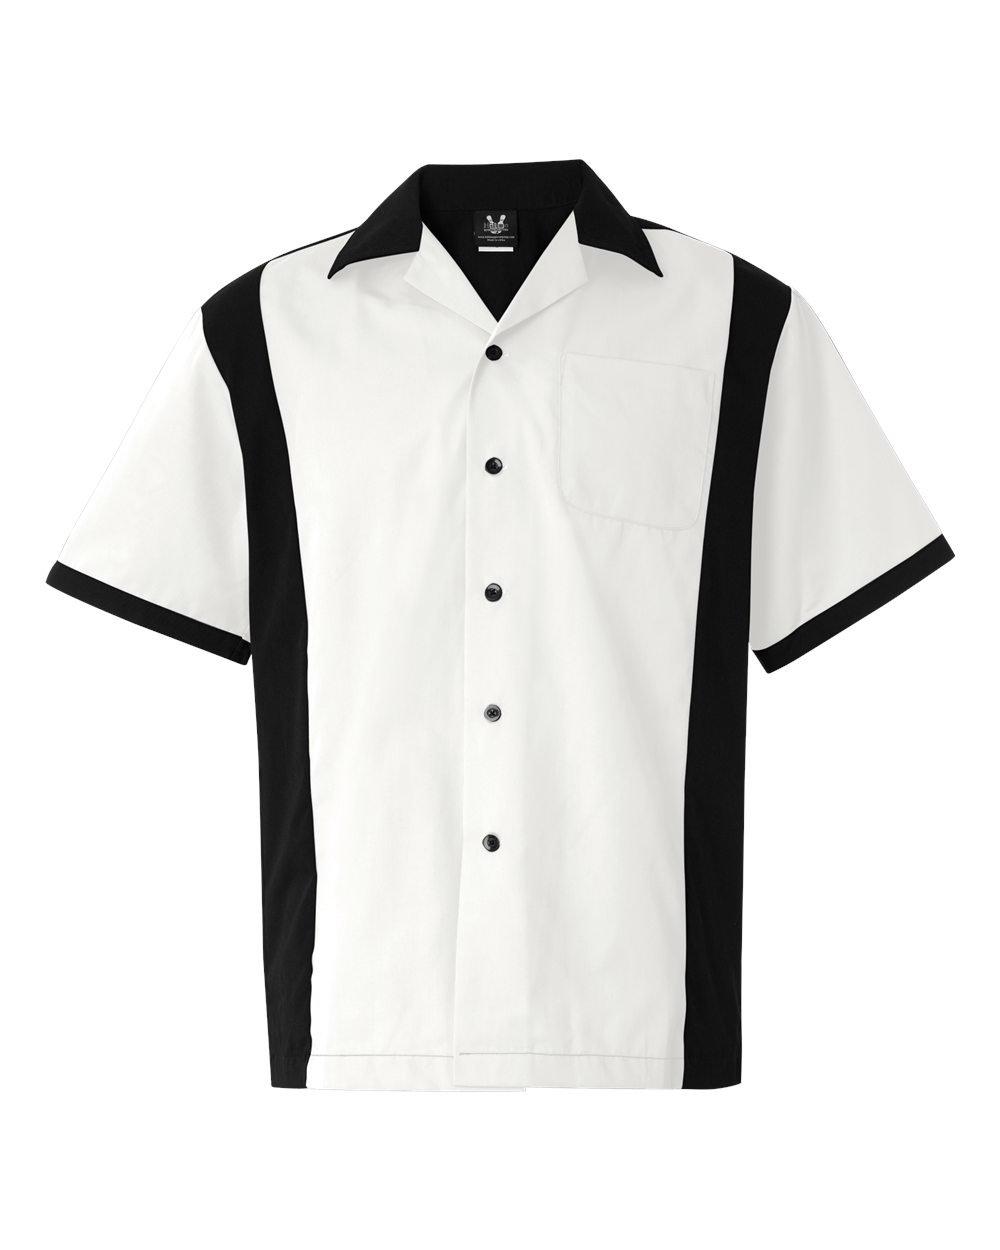 Hilton Bowling Retro Cruiser (White_Black) (3X)